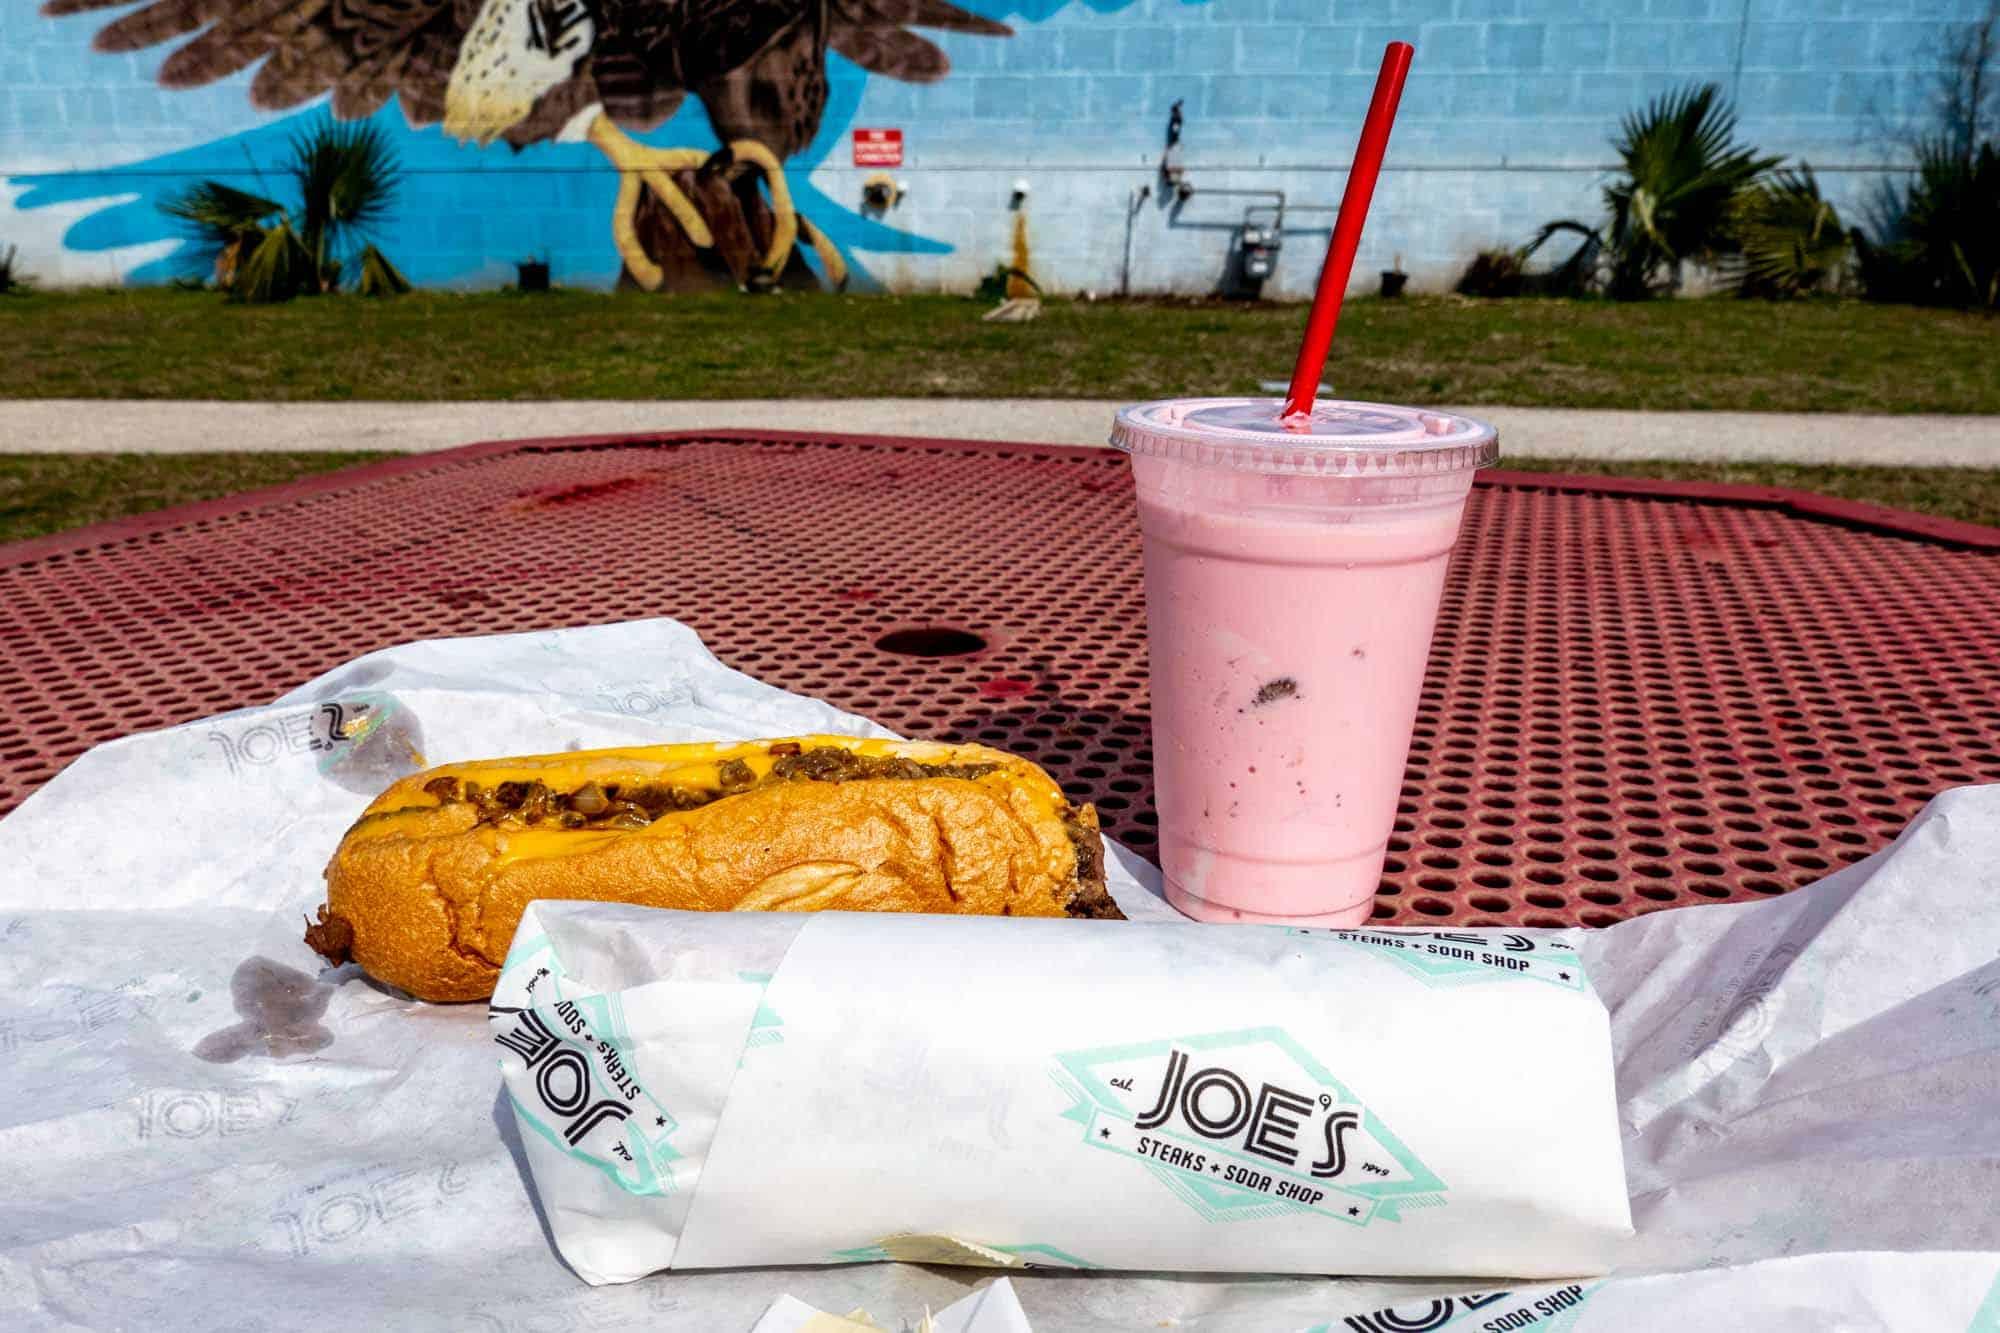 Joe's Steaks + Soda Shop cheesesteak and milkshake